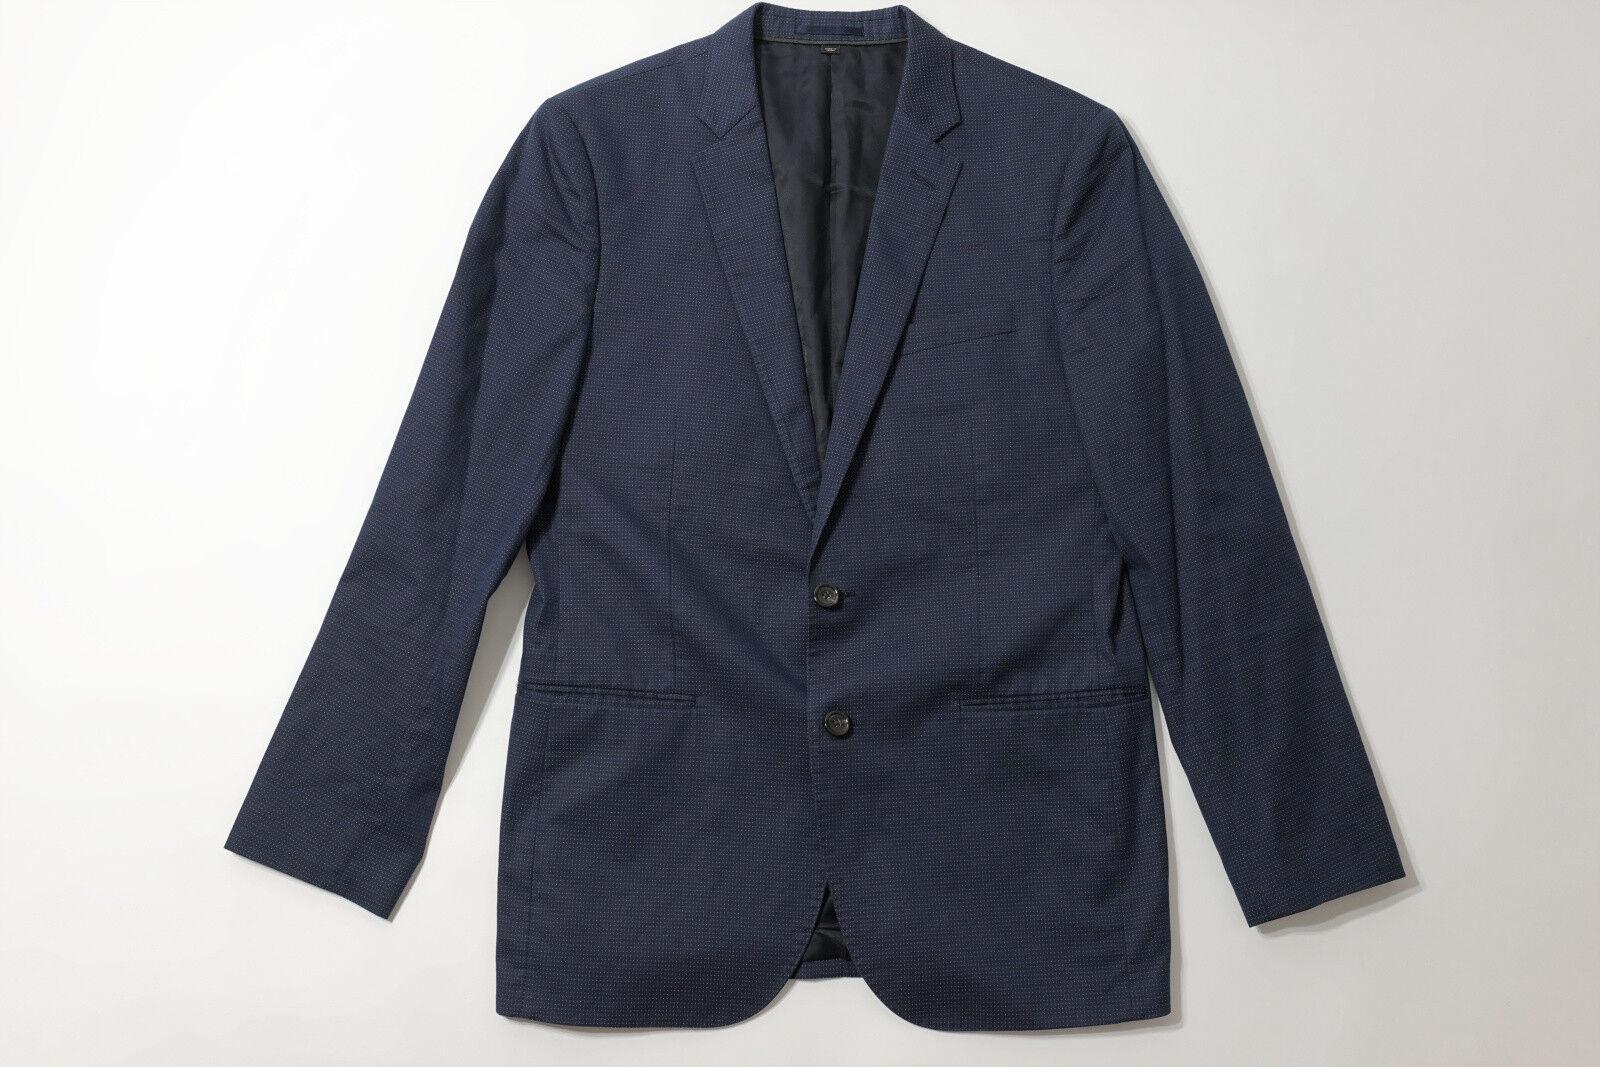 J.Crew Ludlow suit Blazer jacke in dotted indigo Italian baumwolle Größe 40R 40 R